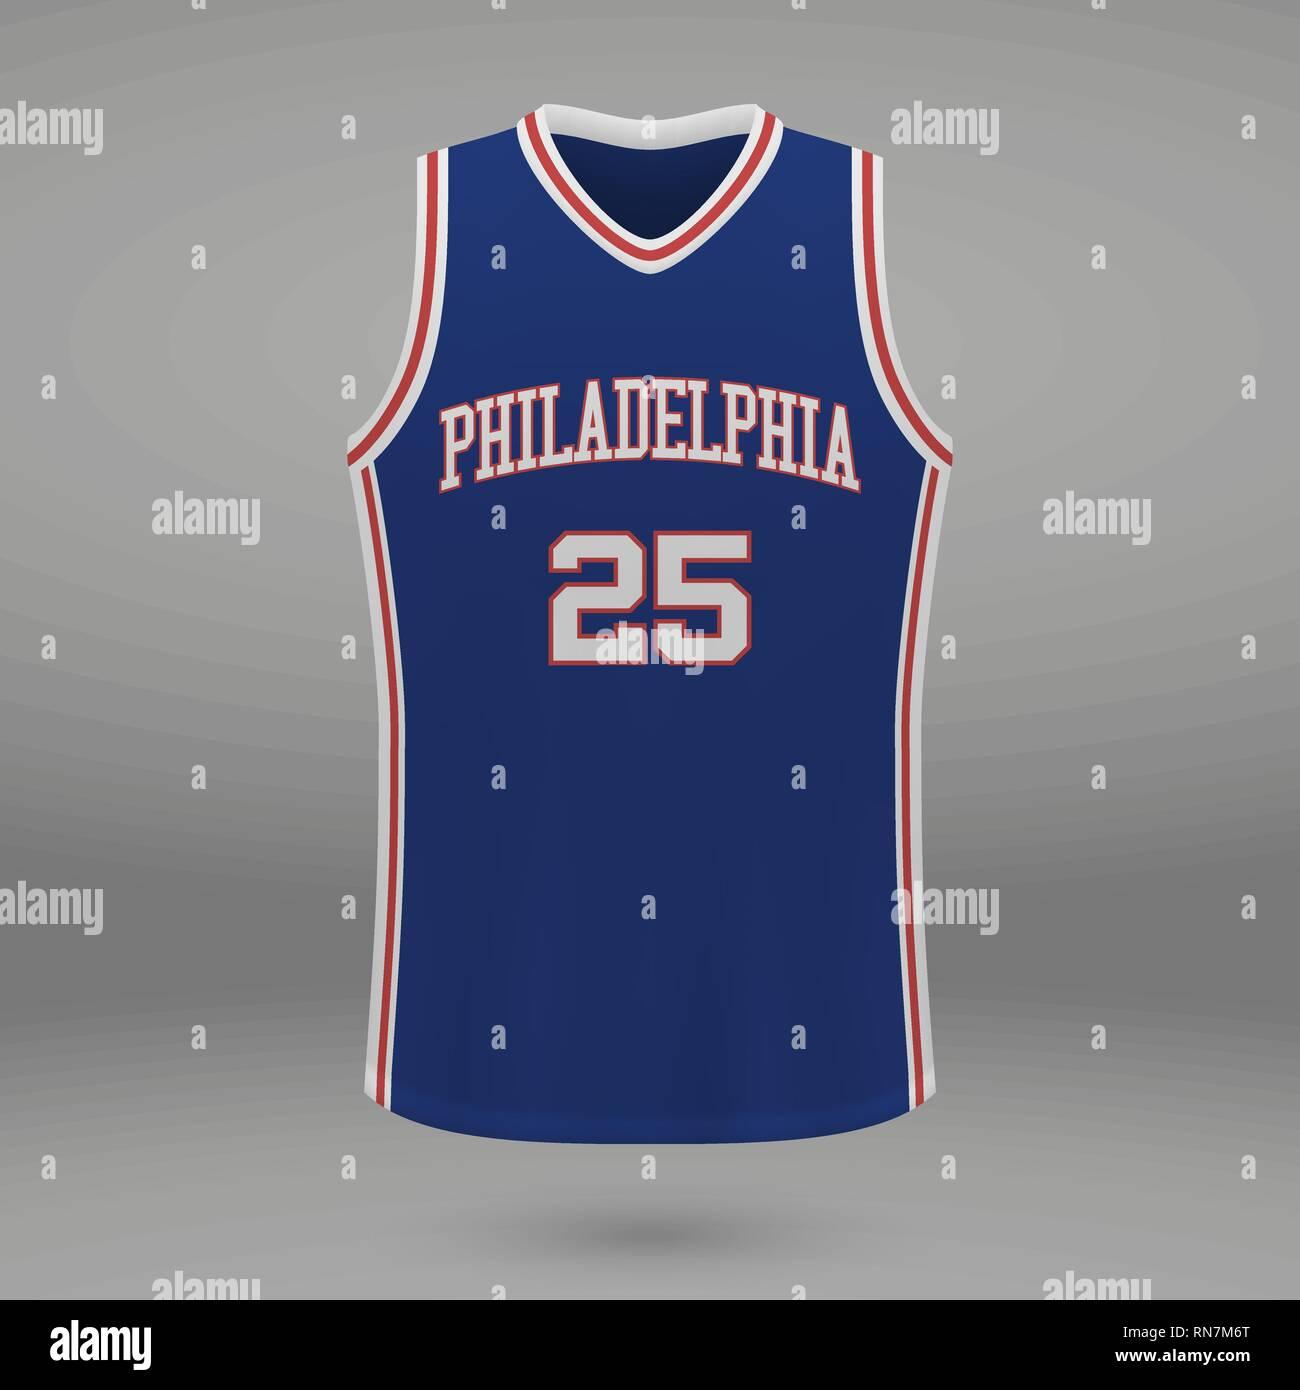 404ea78d7 philadelphia 76ers jersey numbers